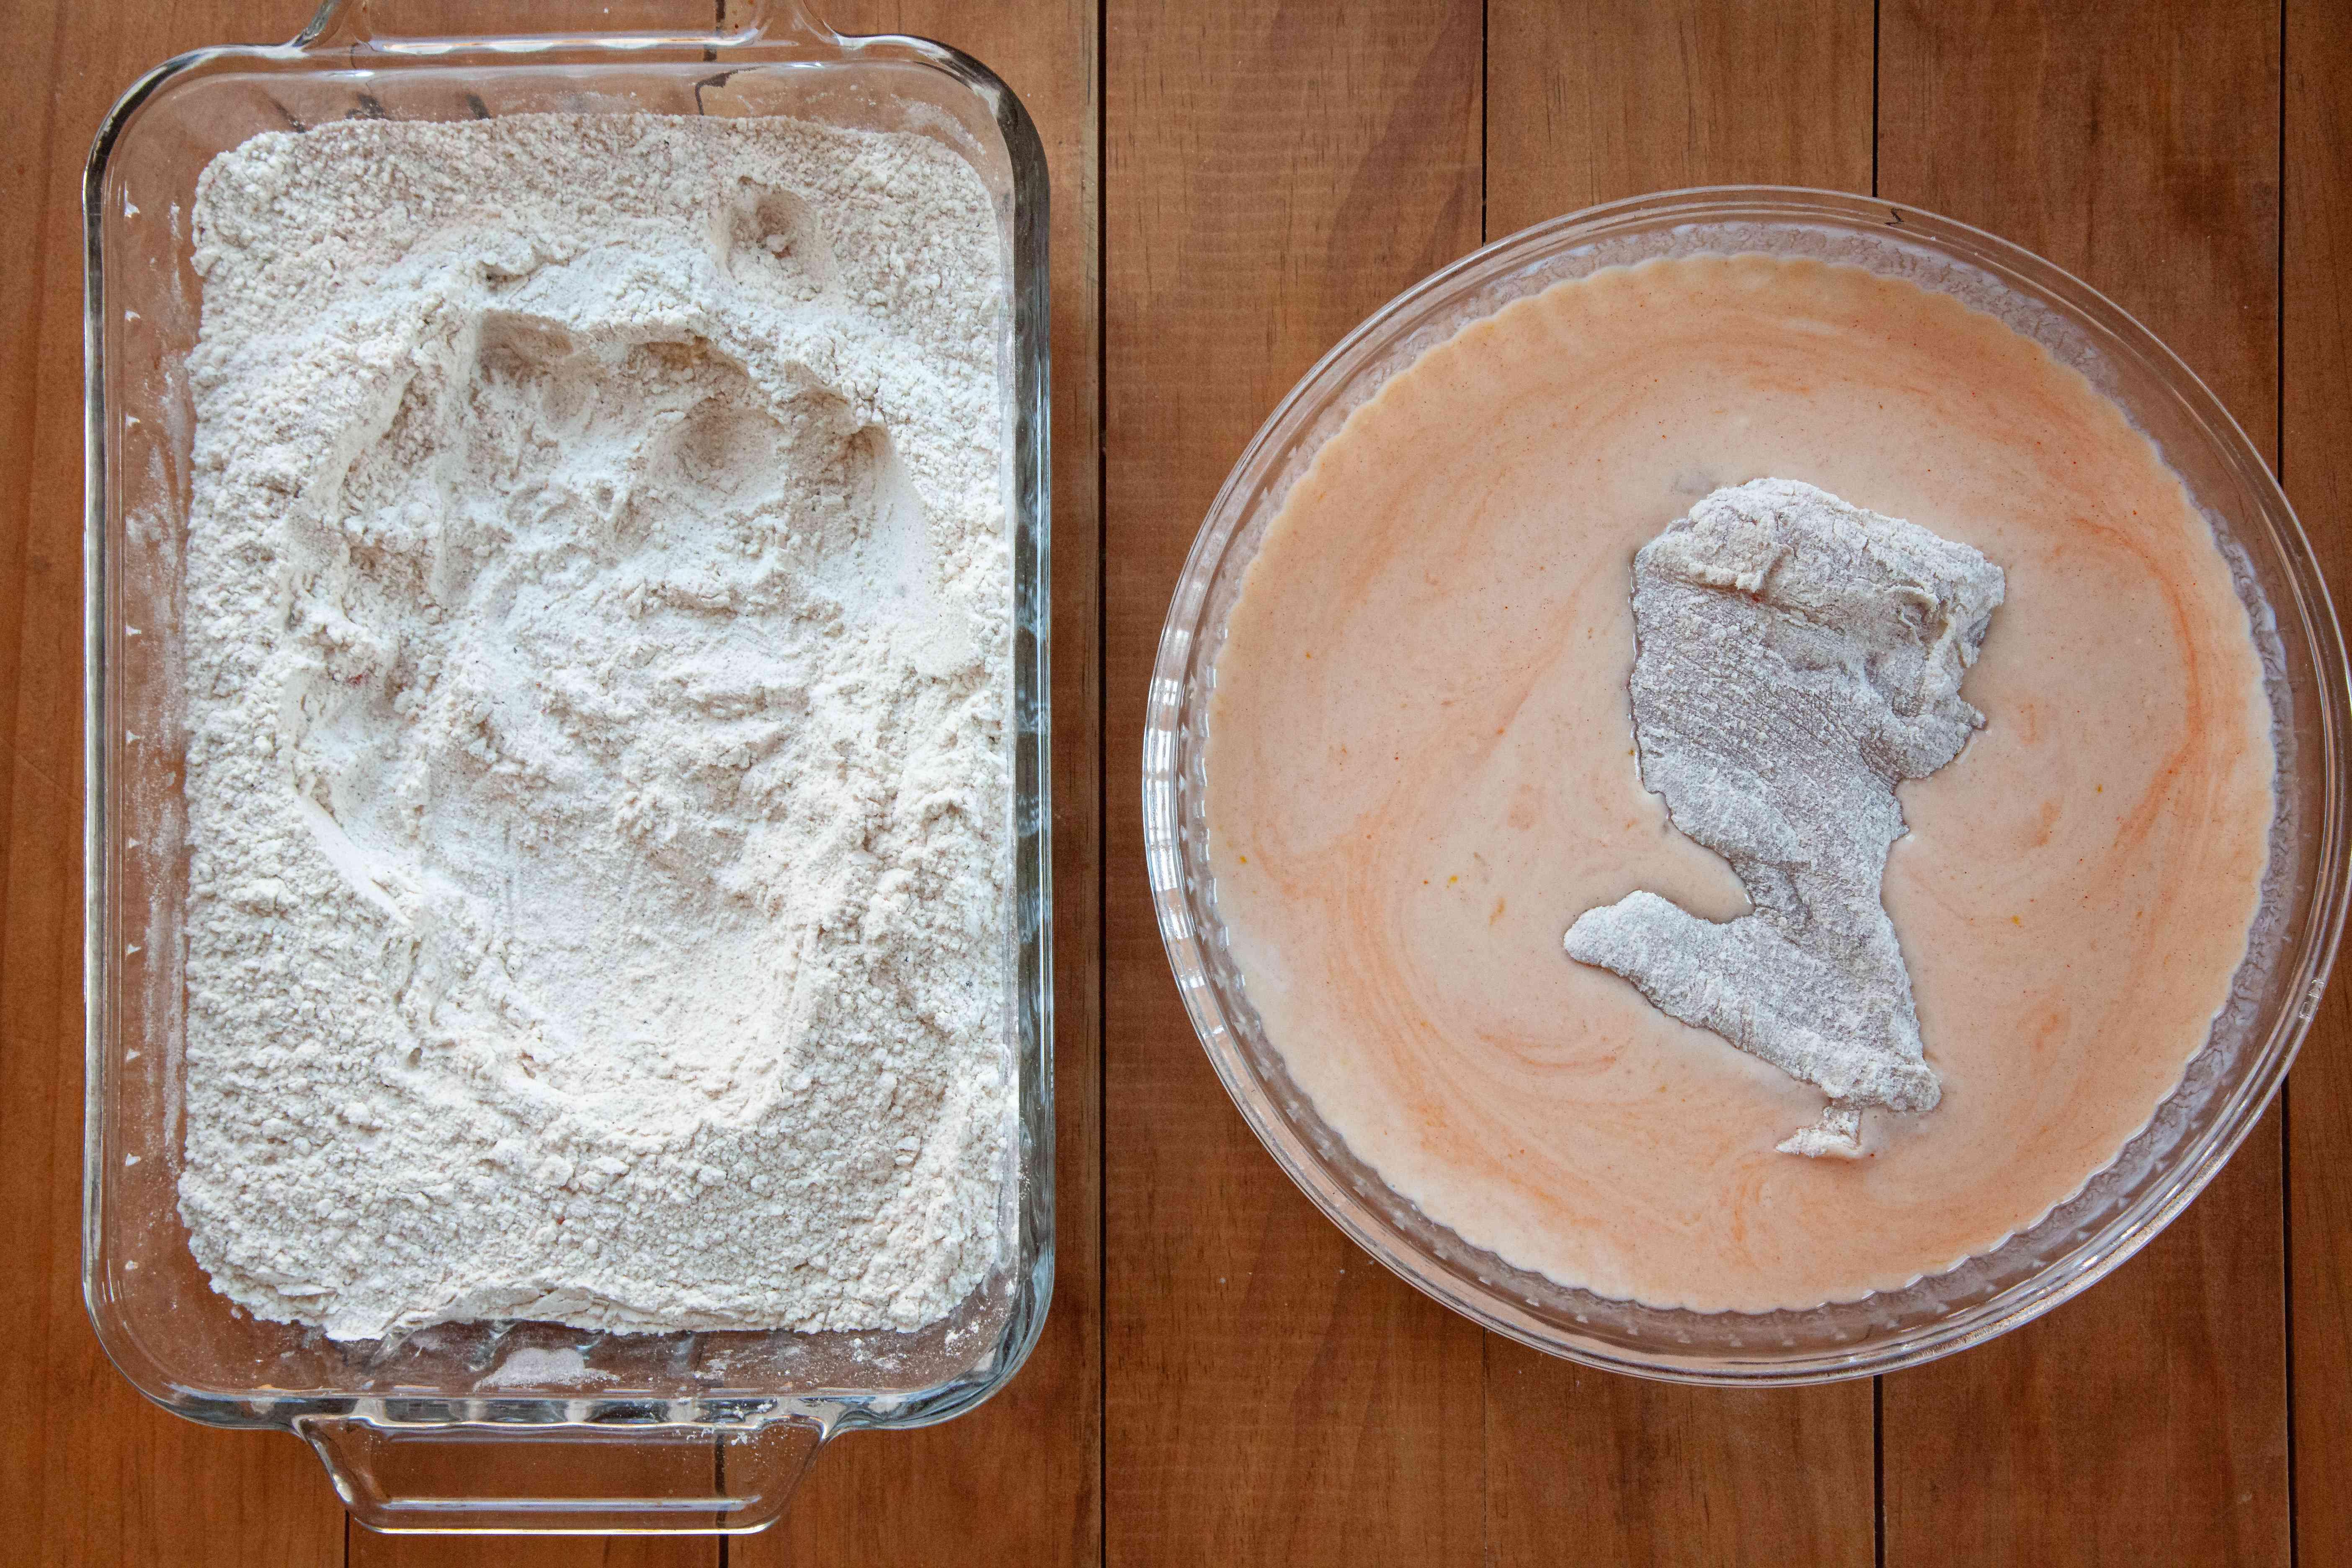 Floured chicken thigh set in the wet mixture for a Nashville-style hot fried chicken.